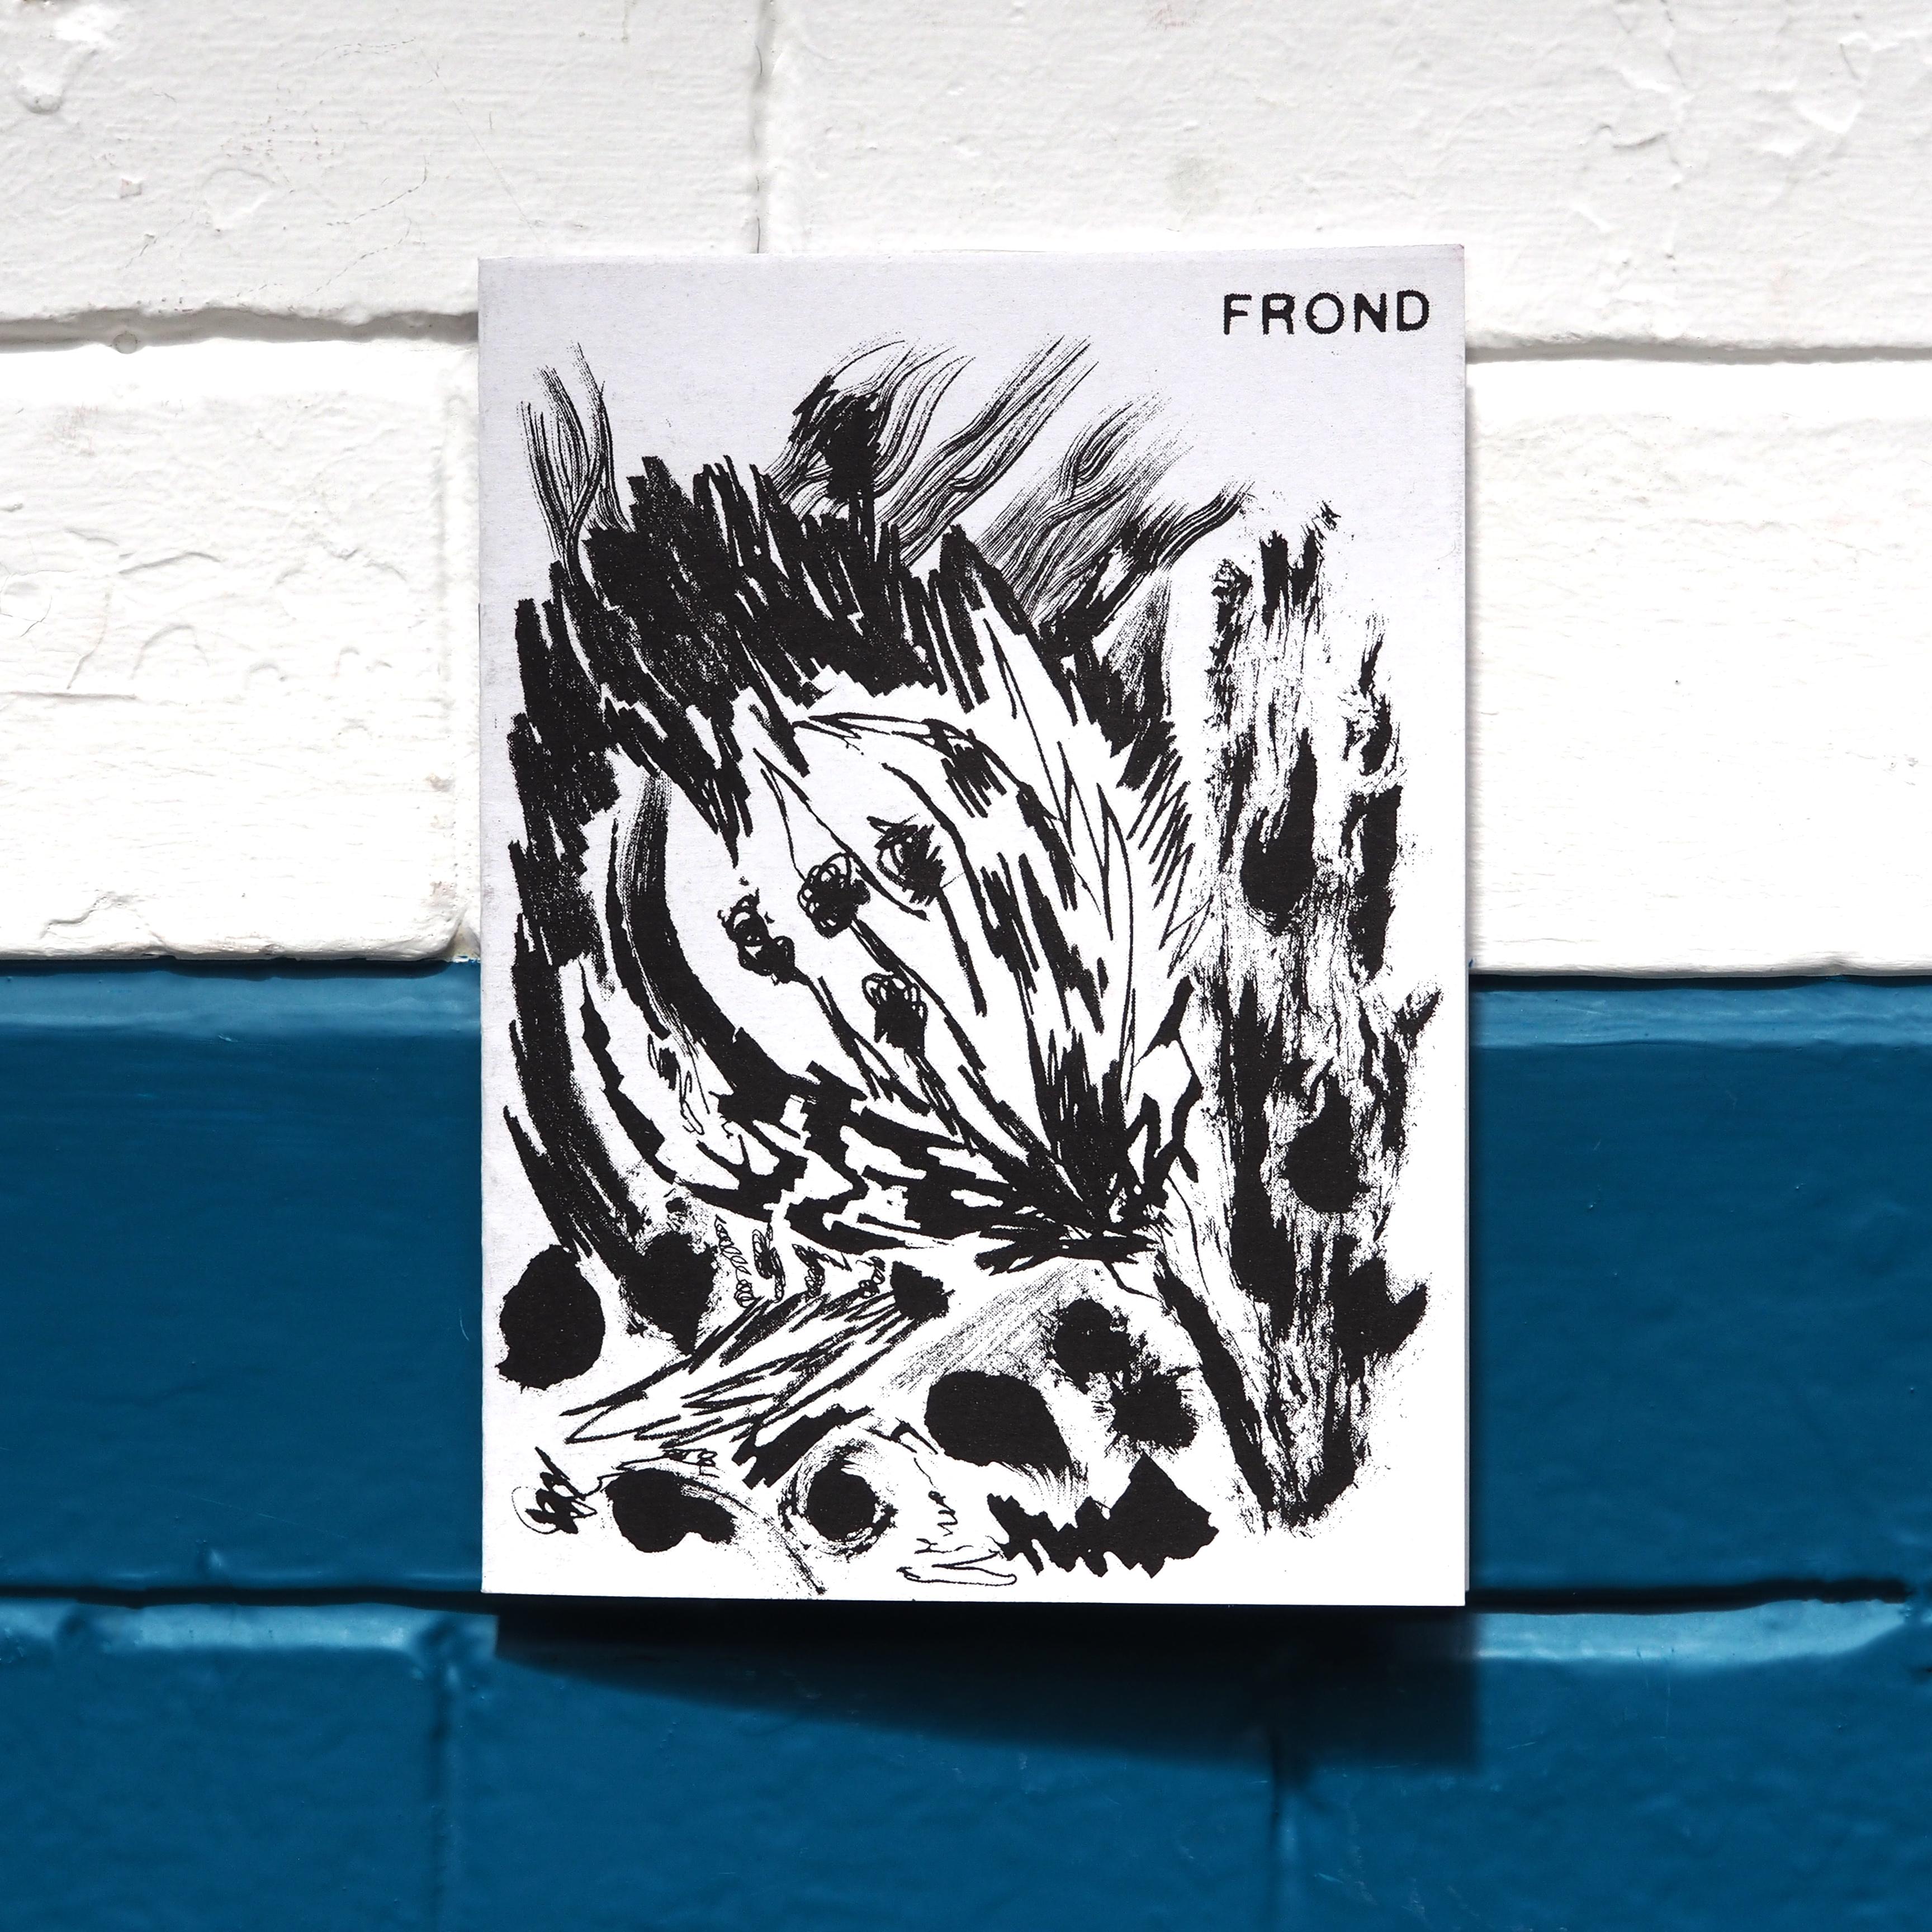 Frond- Adam Foy